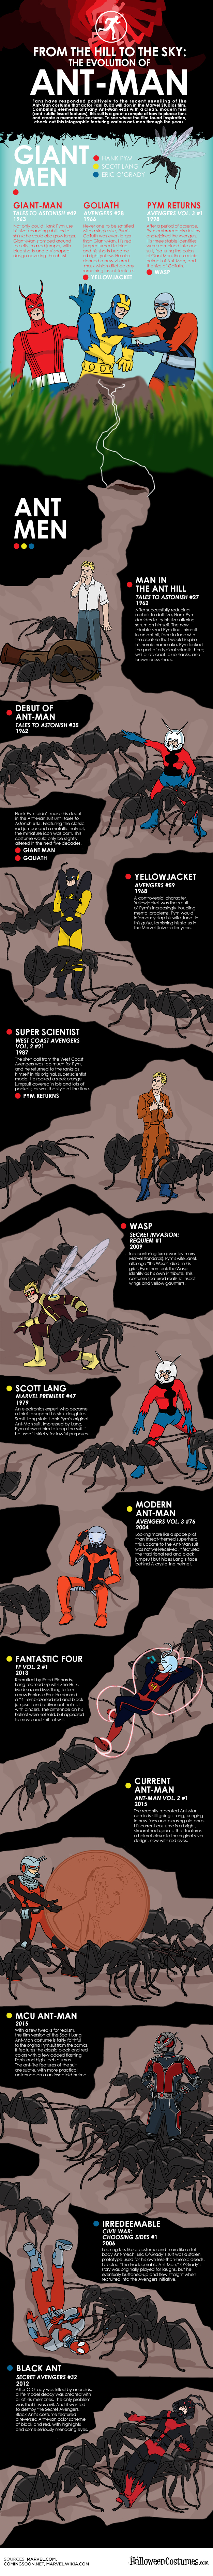 Evolution of Ant-Man Infographic